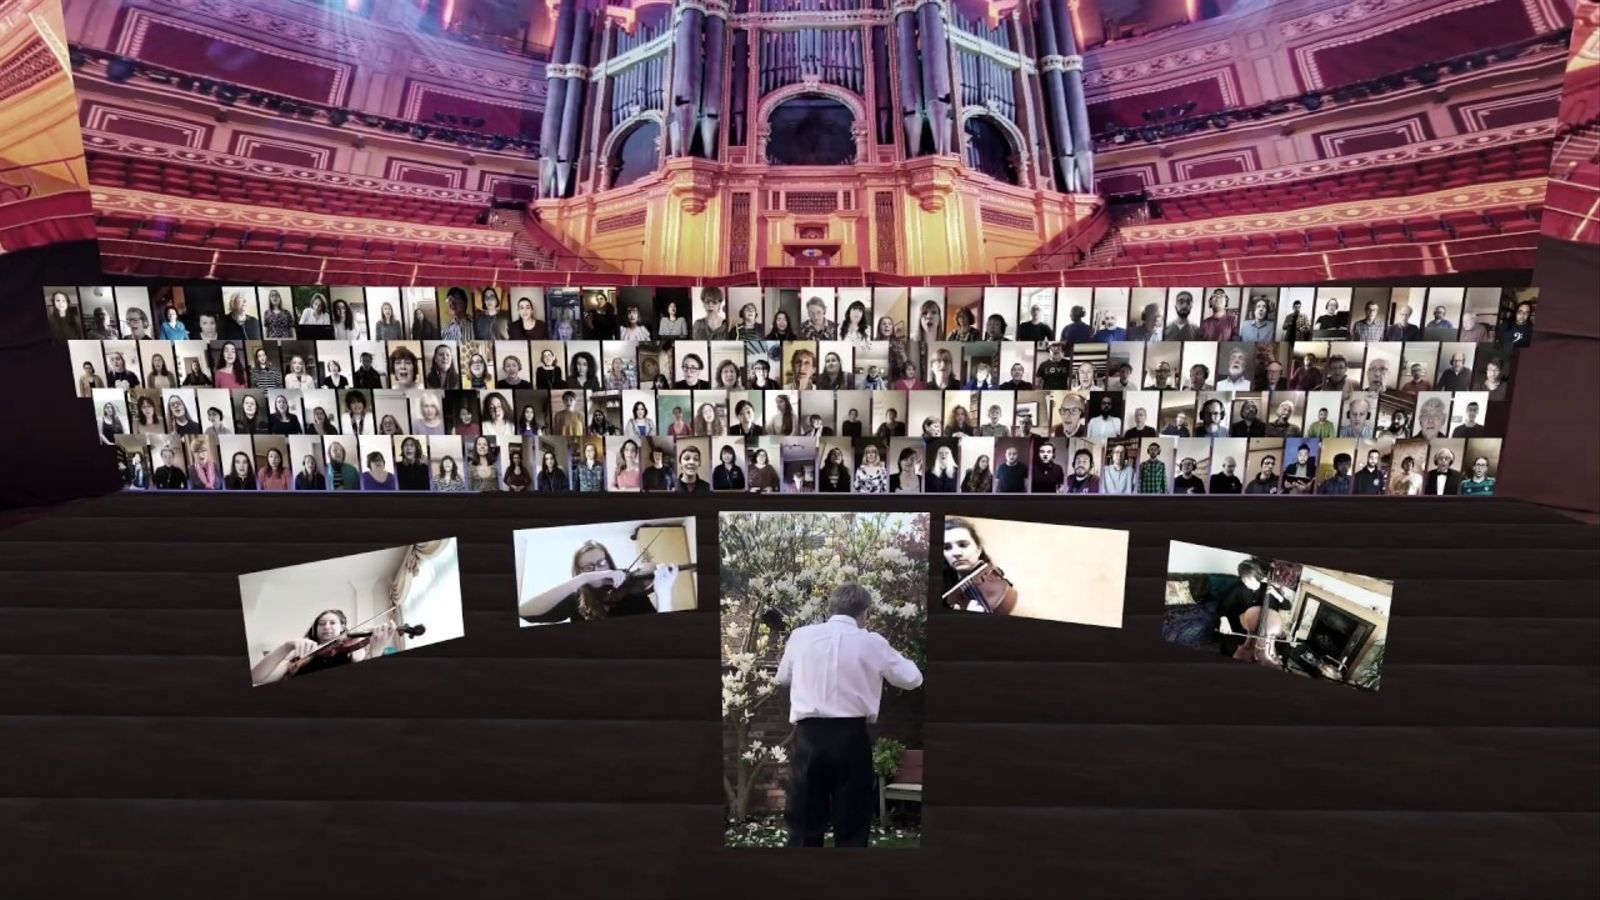 'Ave Verum', de Mozart, per l'Orfeó Català, London Symphony Chorus & CBSO Chorus